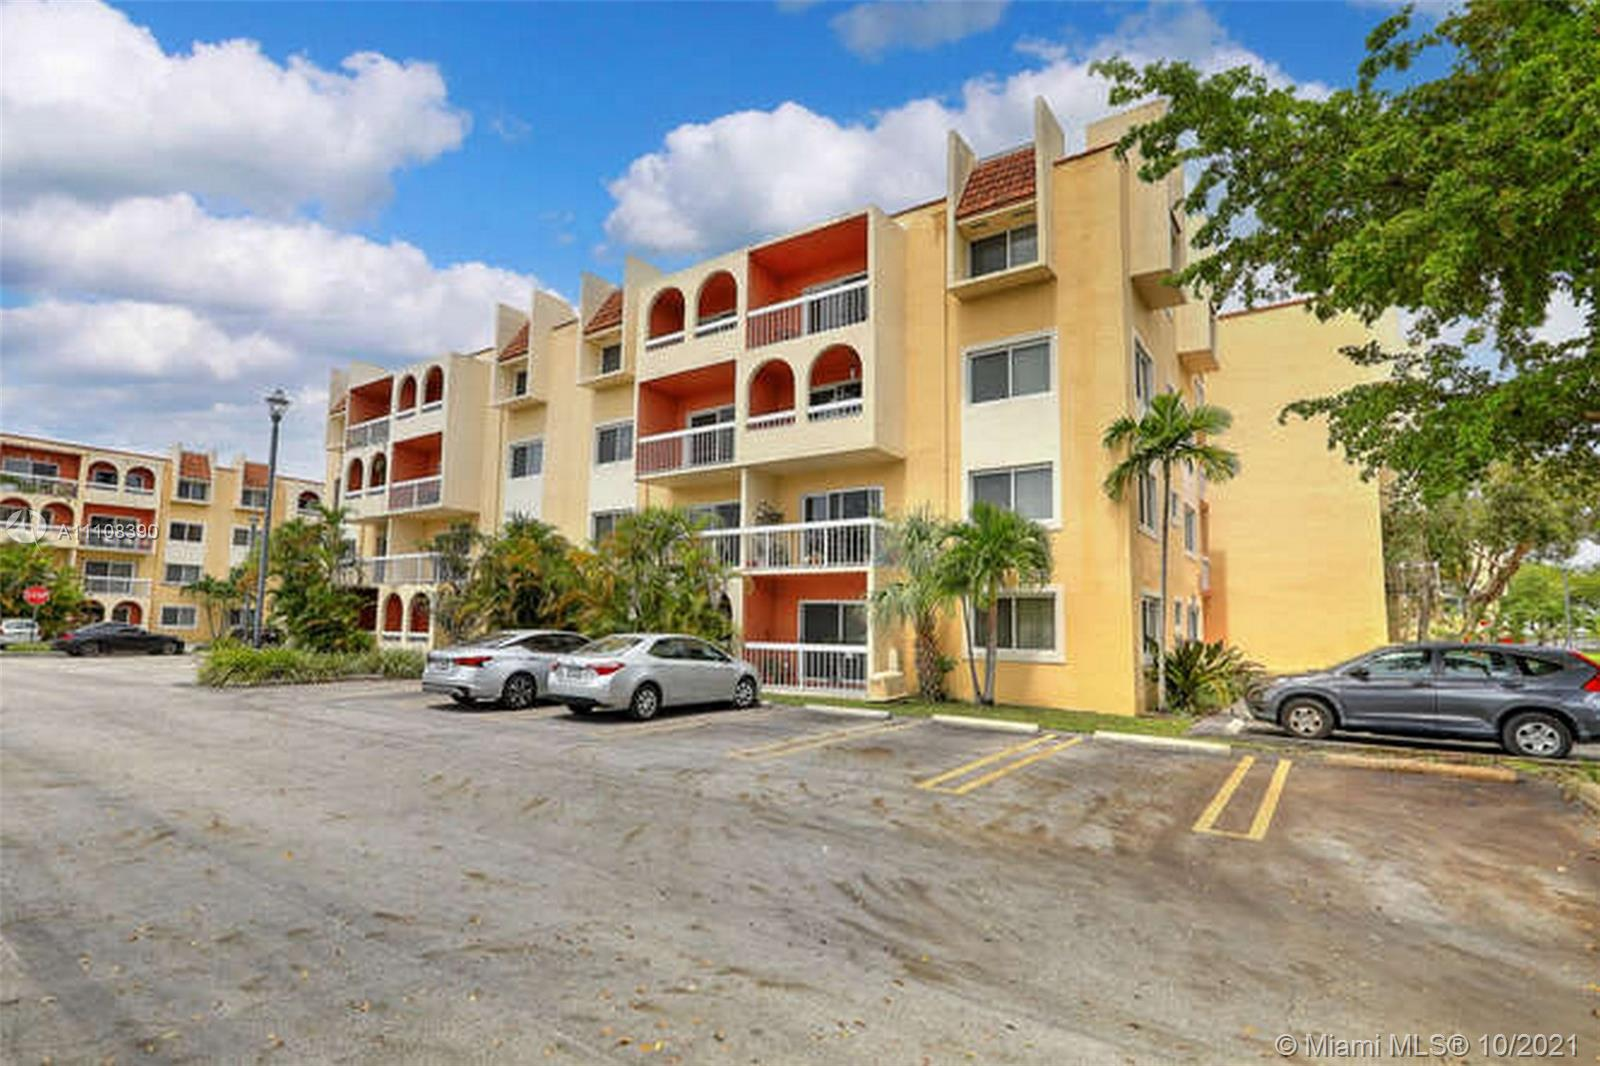 7840 Camino Real Unit 206, Miami, Florida 33143